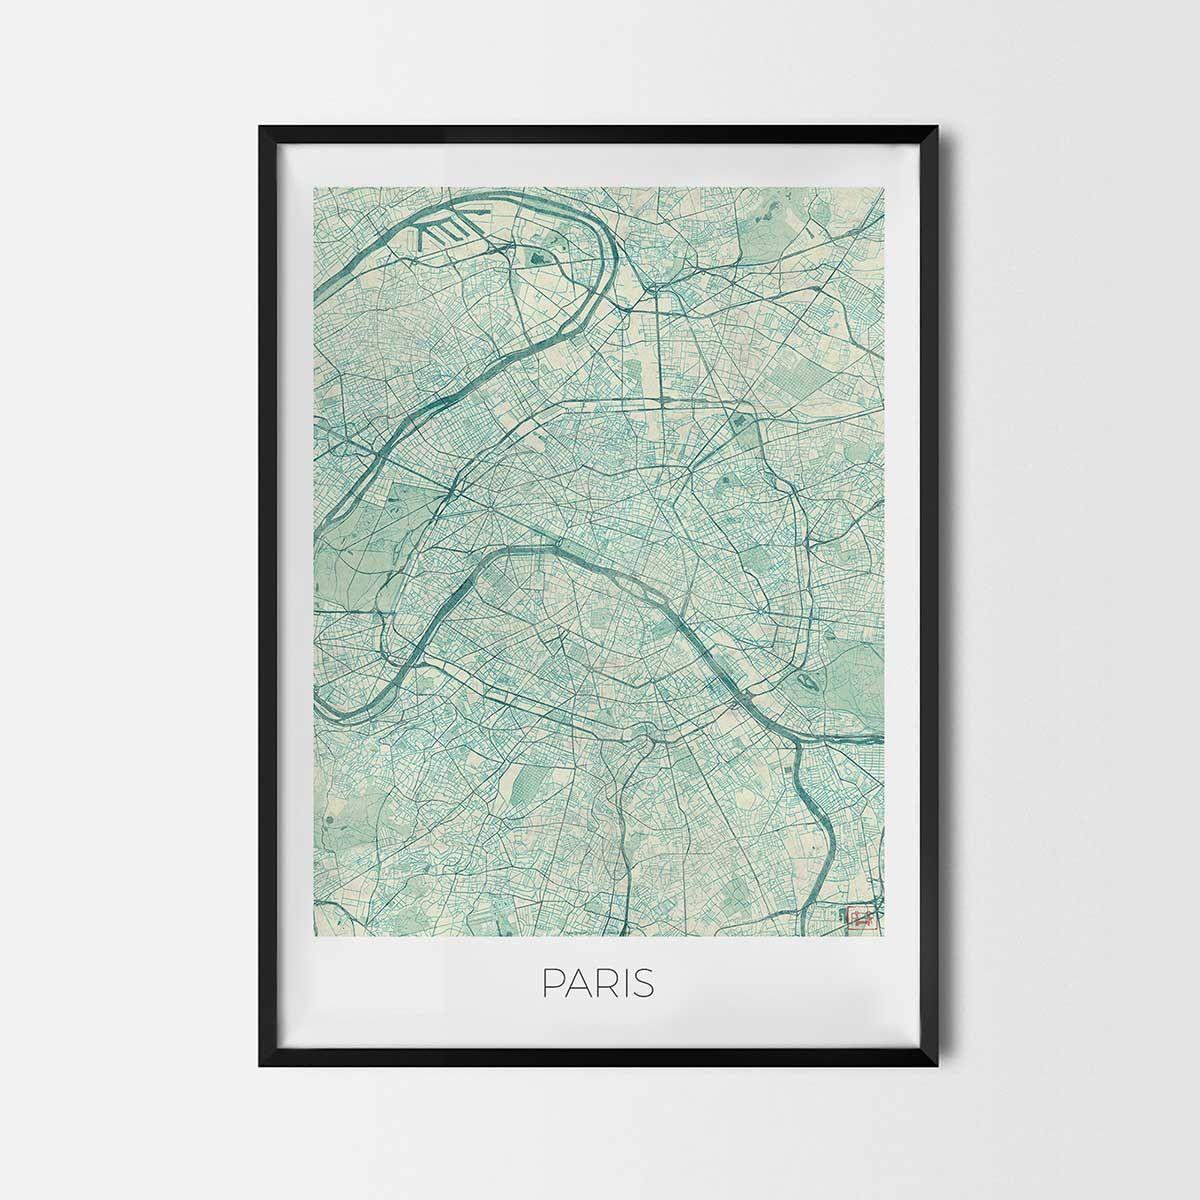 Pariisin Kartta Juliste Juliste Kartta Pariisi Ile De France